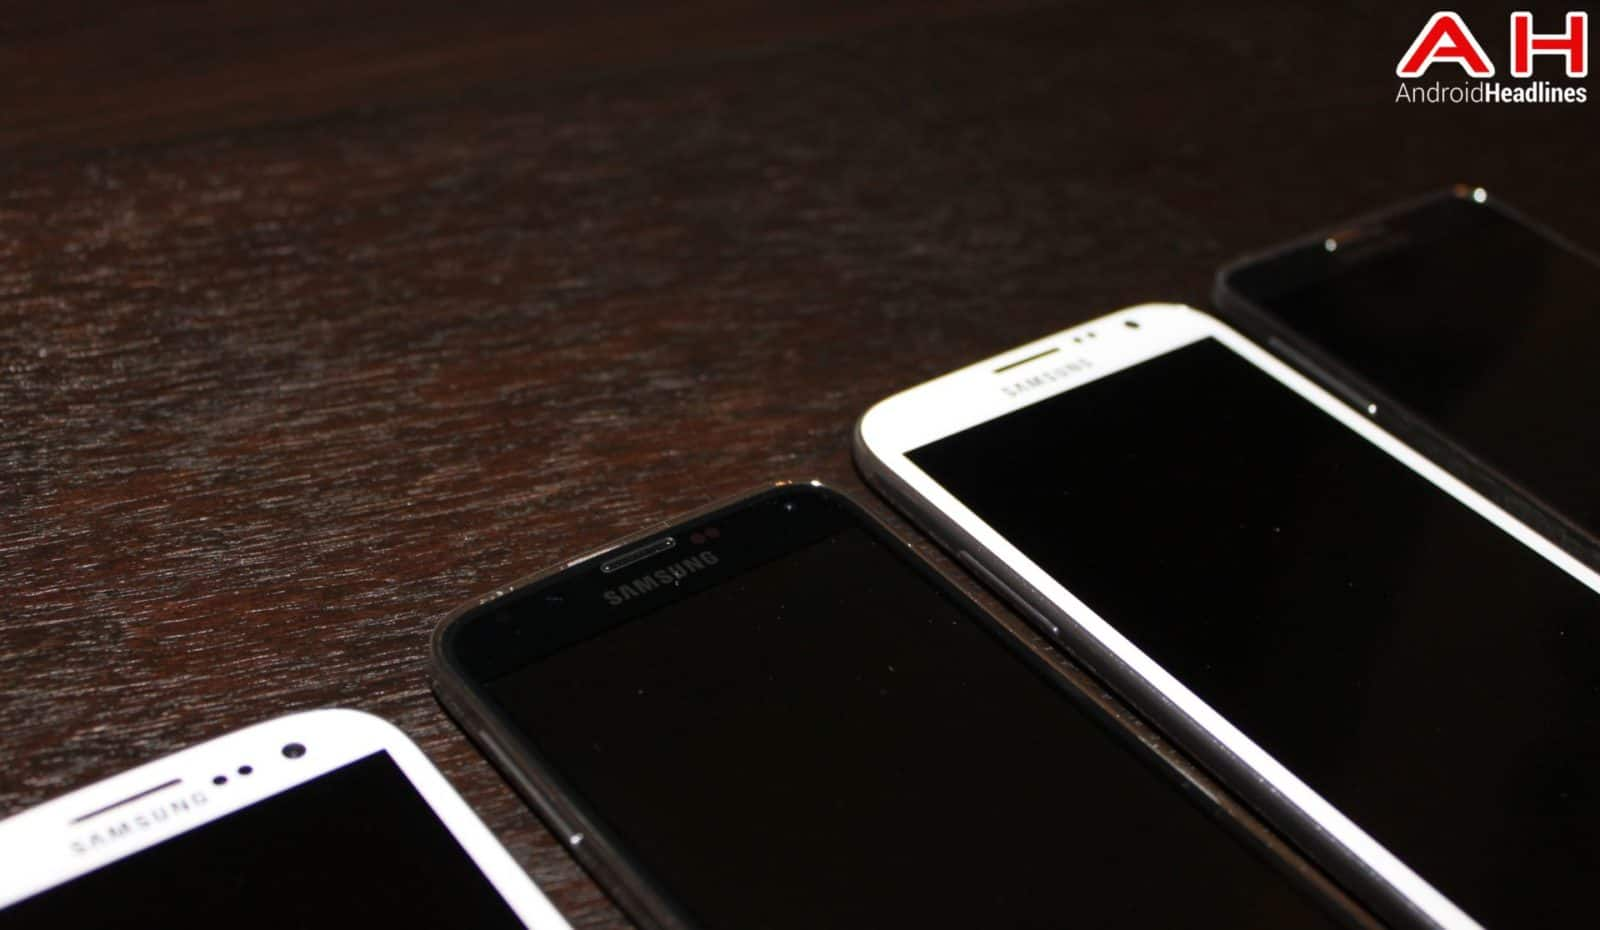 AH Samsung Galaxy S5 Galxy Note 3 Galxy Note 2 Galaxy S3  Logo 2.0